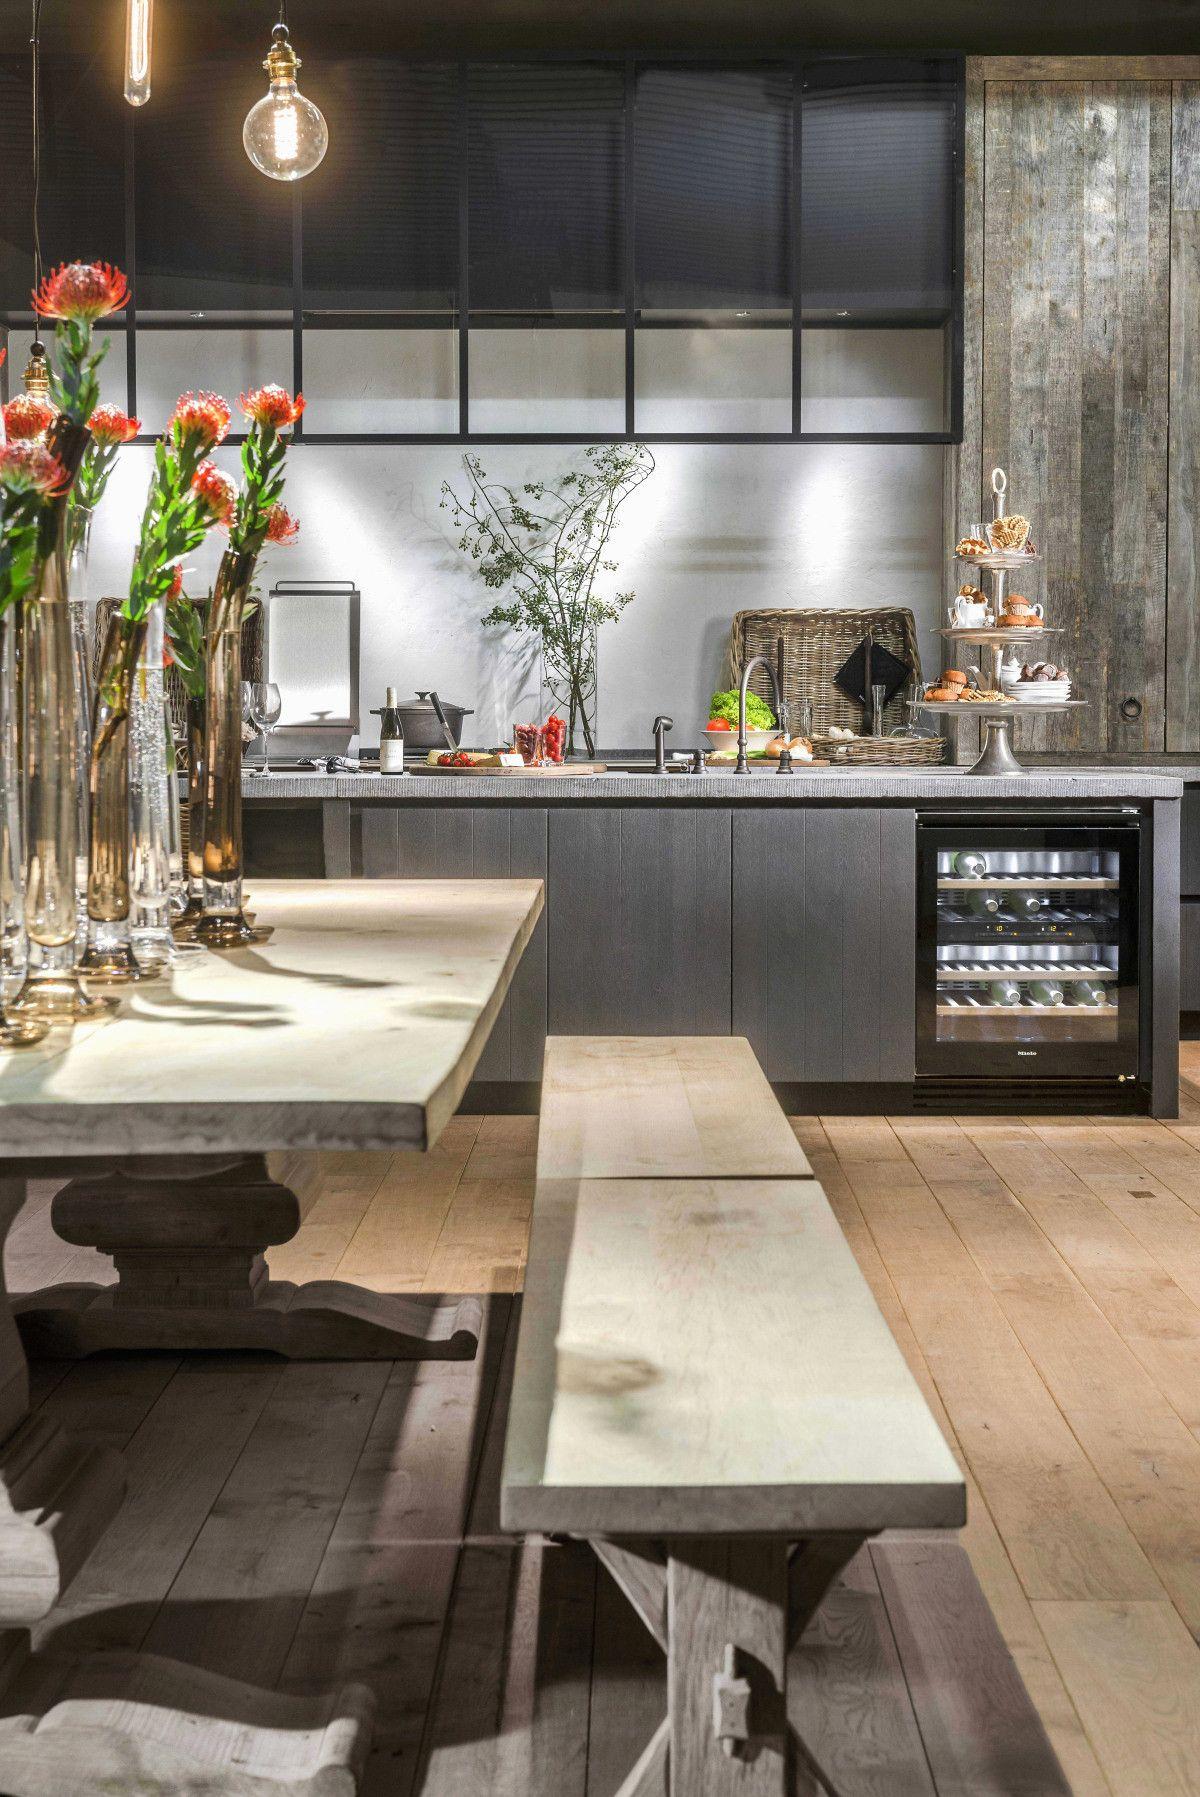 Deco Cuisine Ancienne Campagne fresh cuisine ancienne campagne | déco chambre style